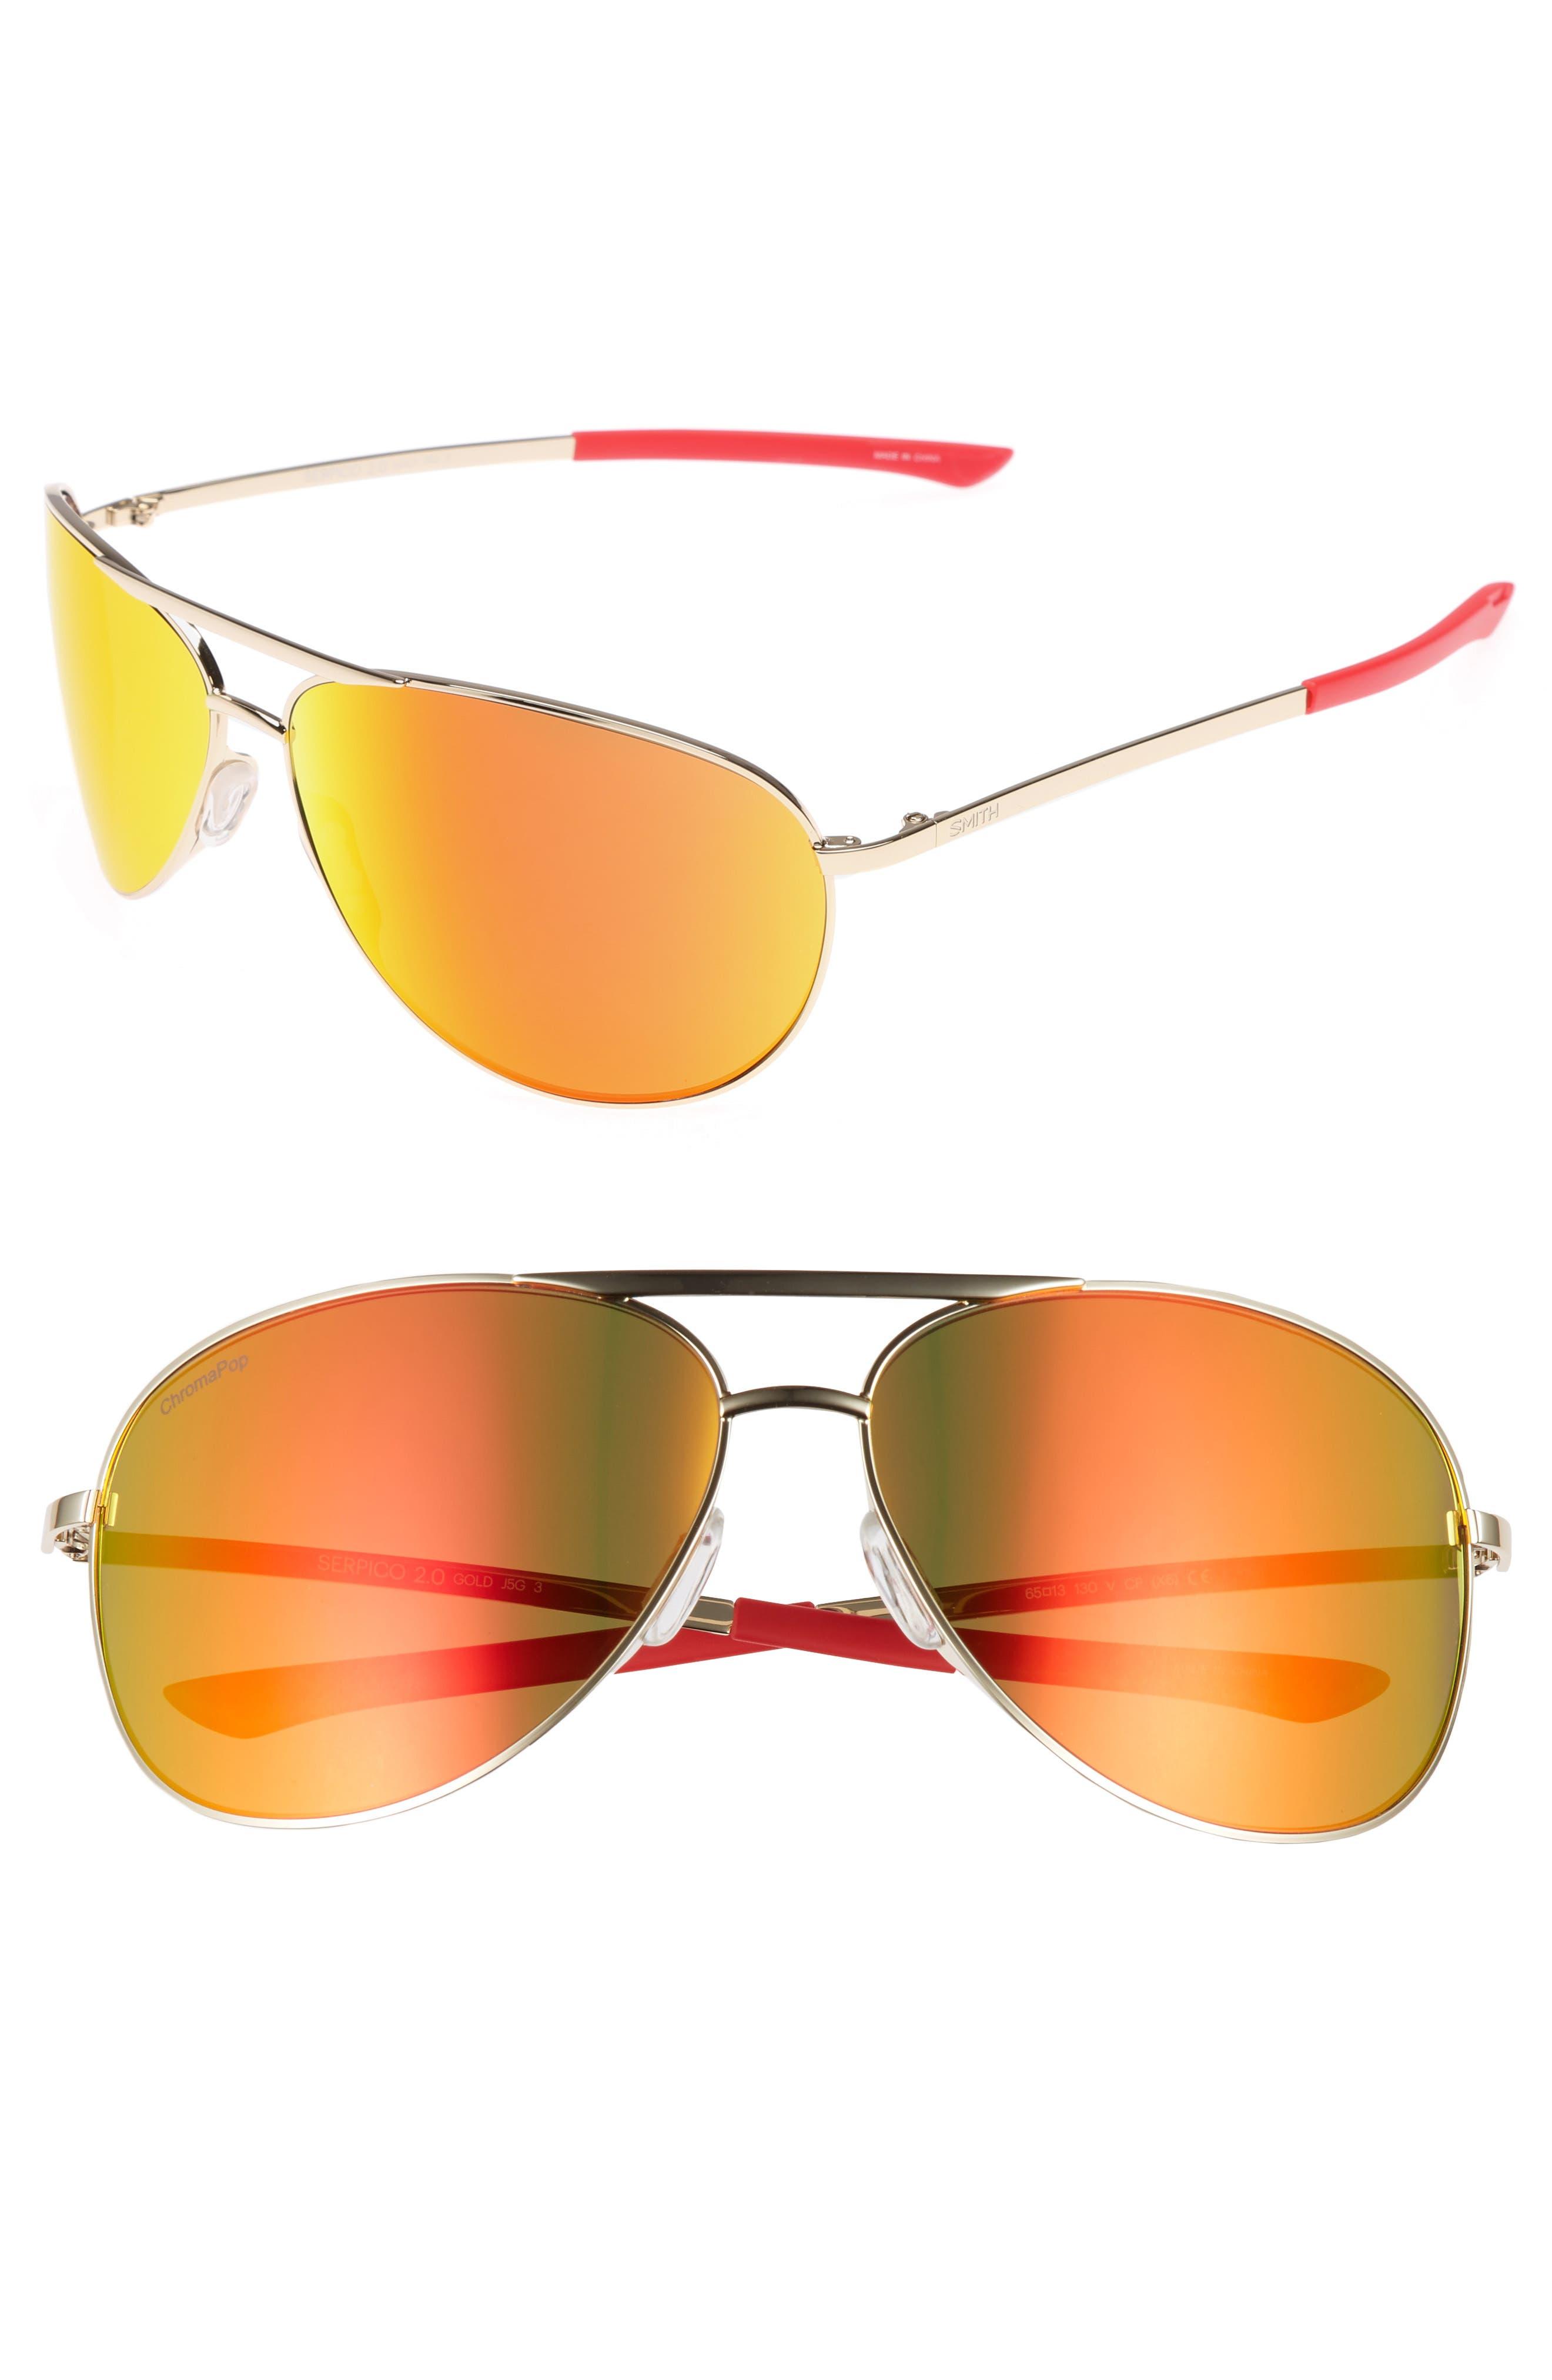 Main Image - Smith Serpico 2 65mm Mirrored ChromaPop™ Polarized Aviator Sunglasses